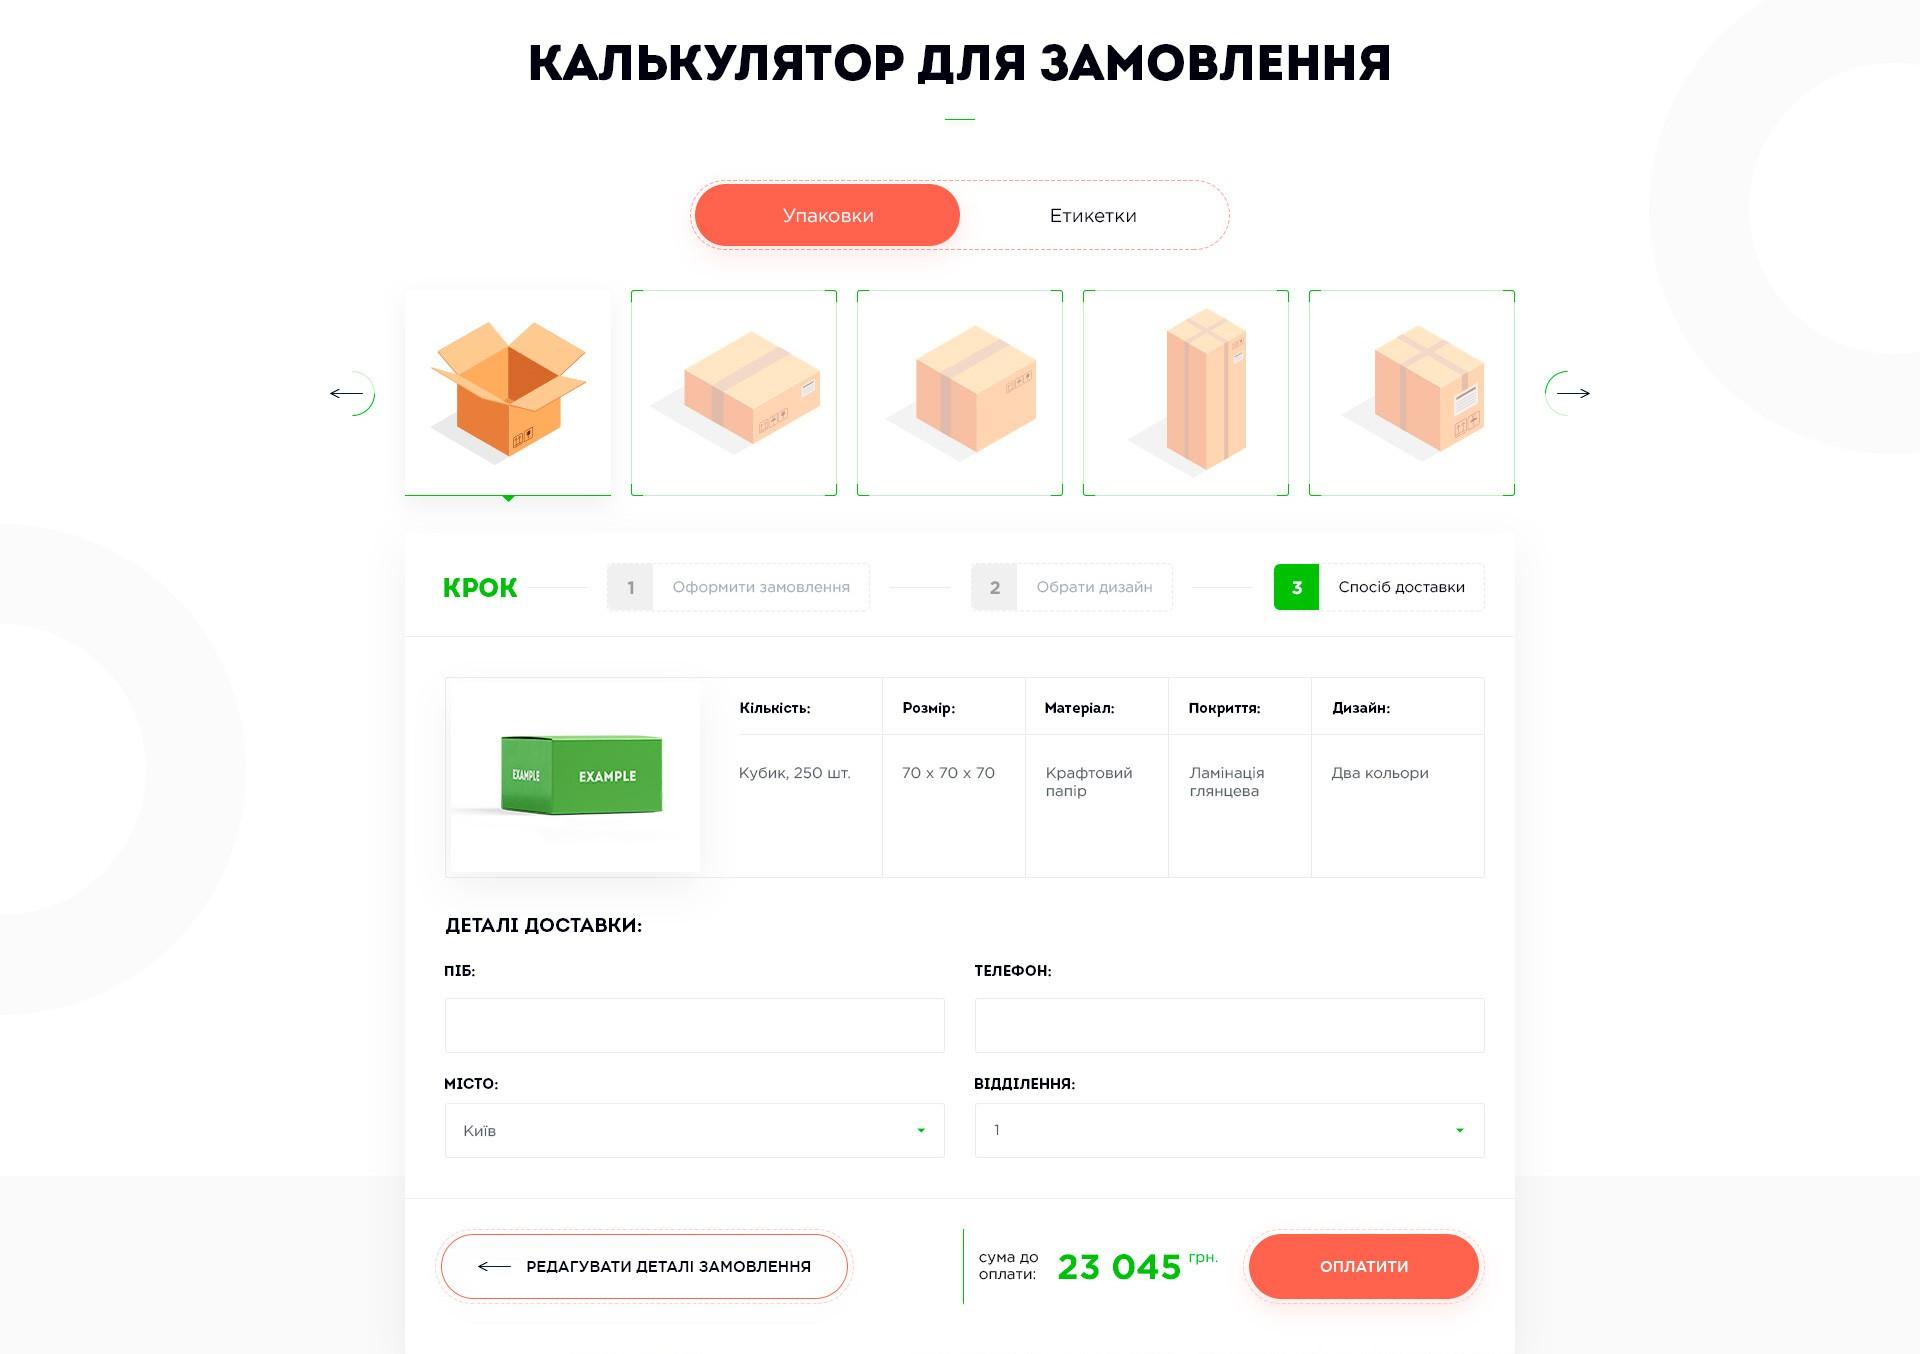 Upakovka_Tab_03_Calculator_0.`1